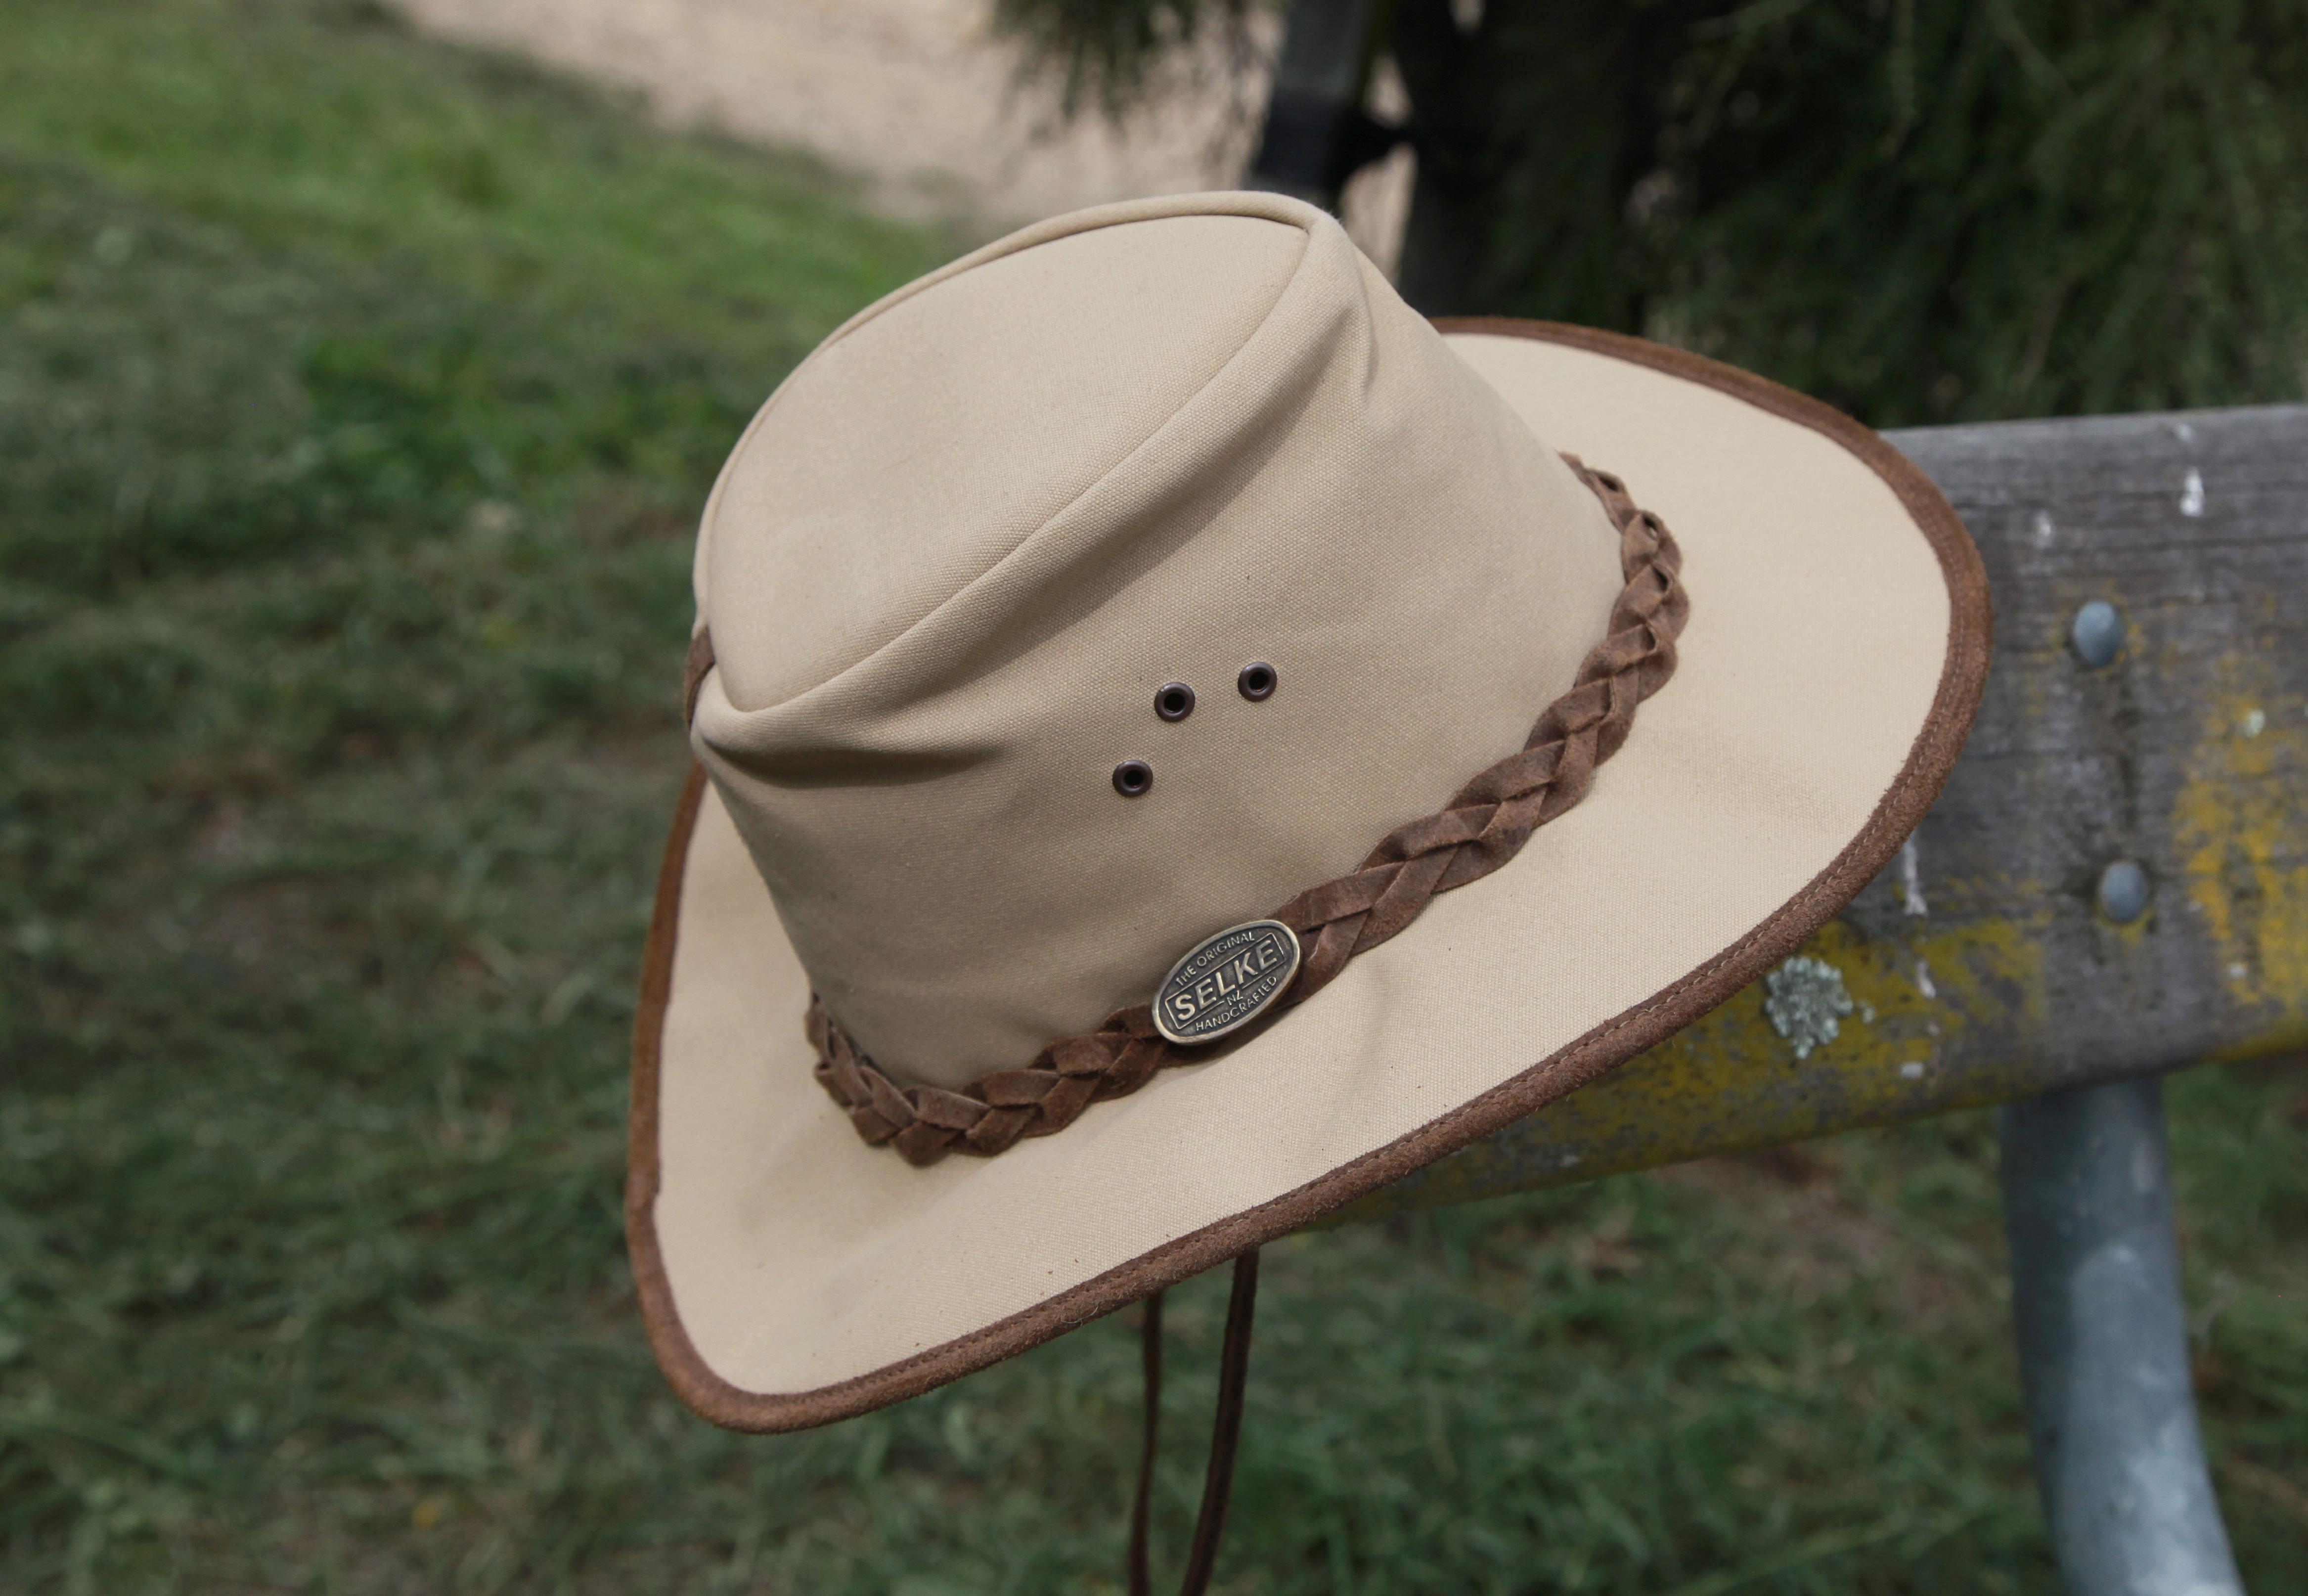 eba5e3bae02 Canvas Hat - Selke NZ high quality handcrafted leather   fabric hats